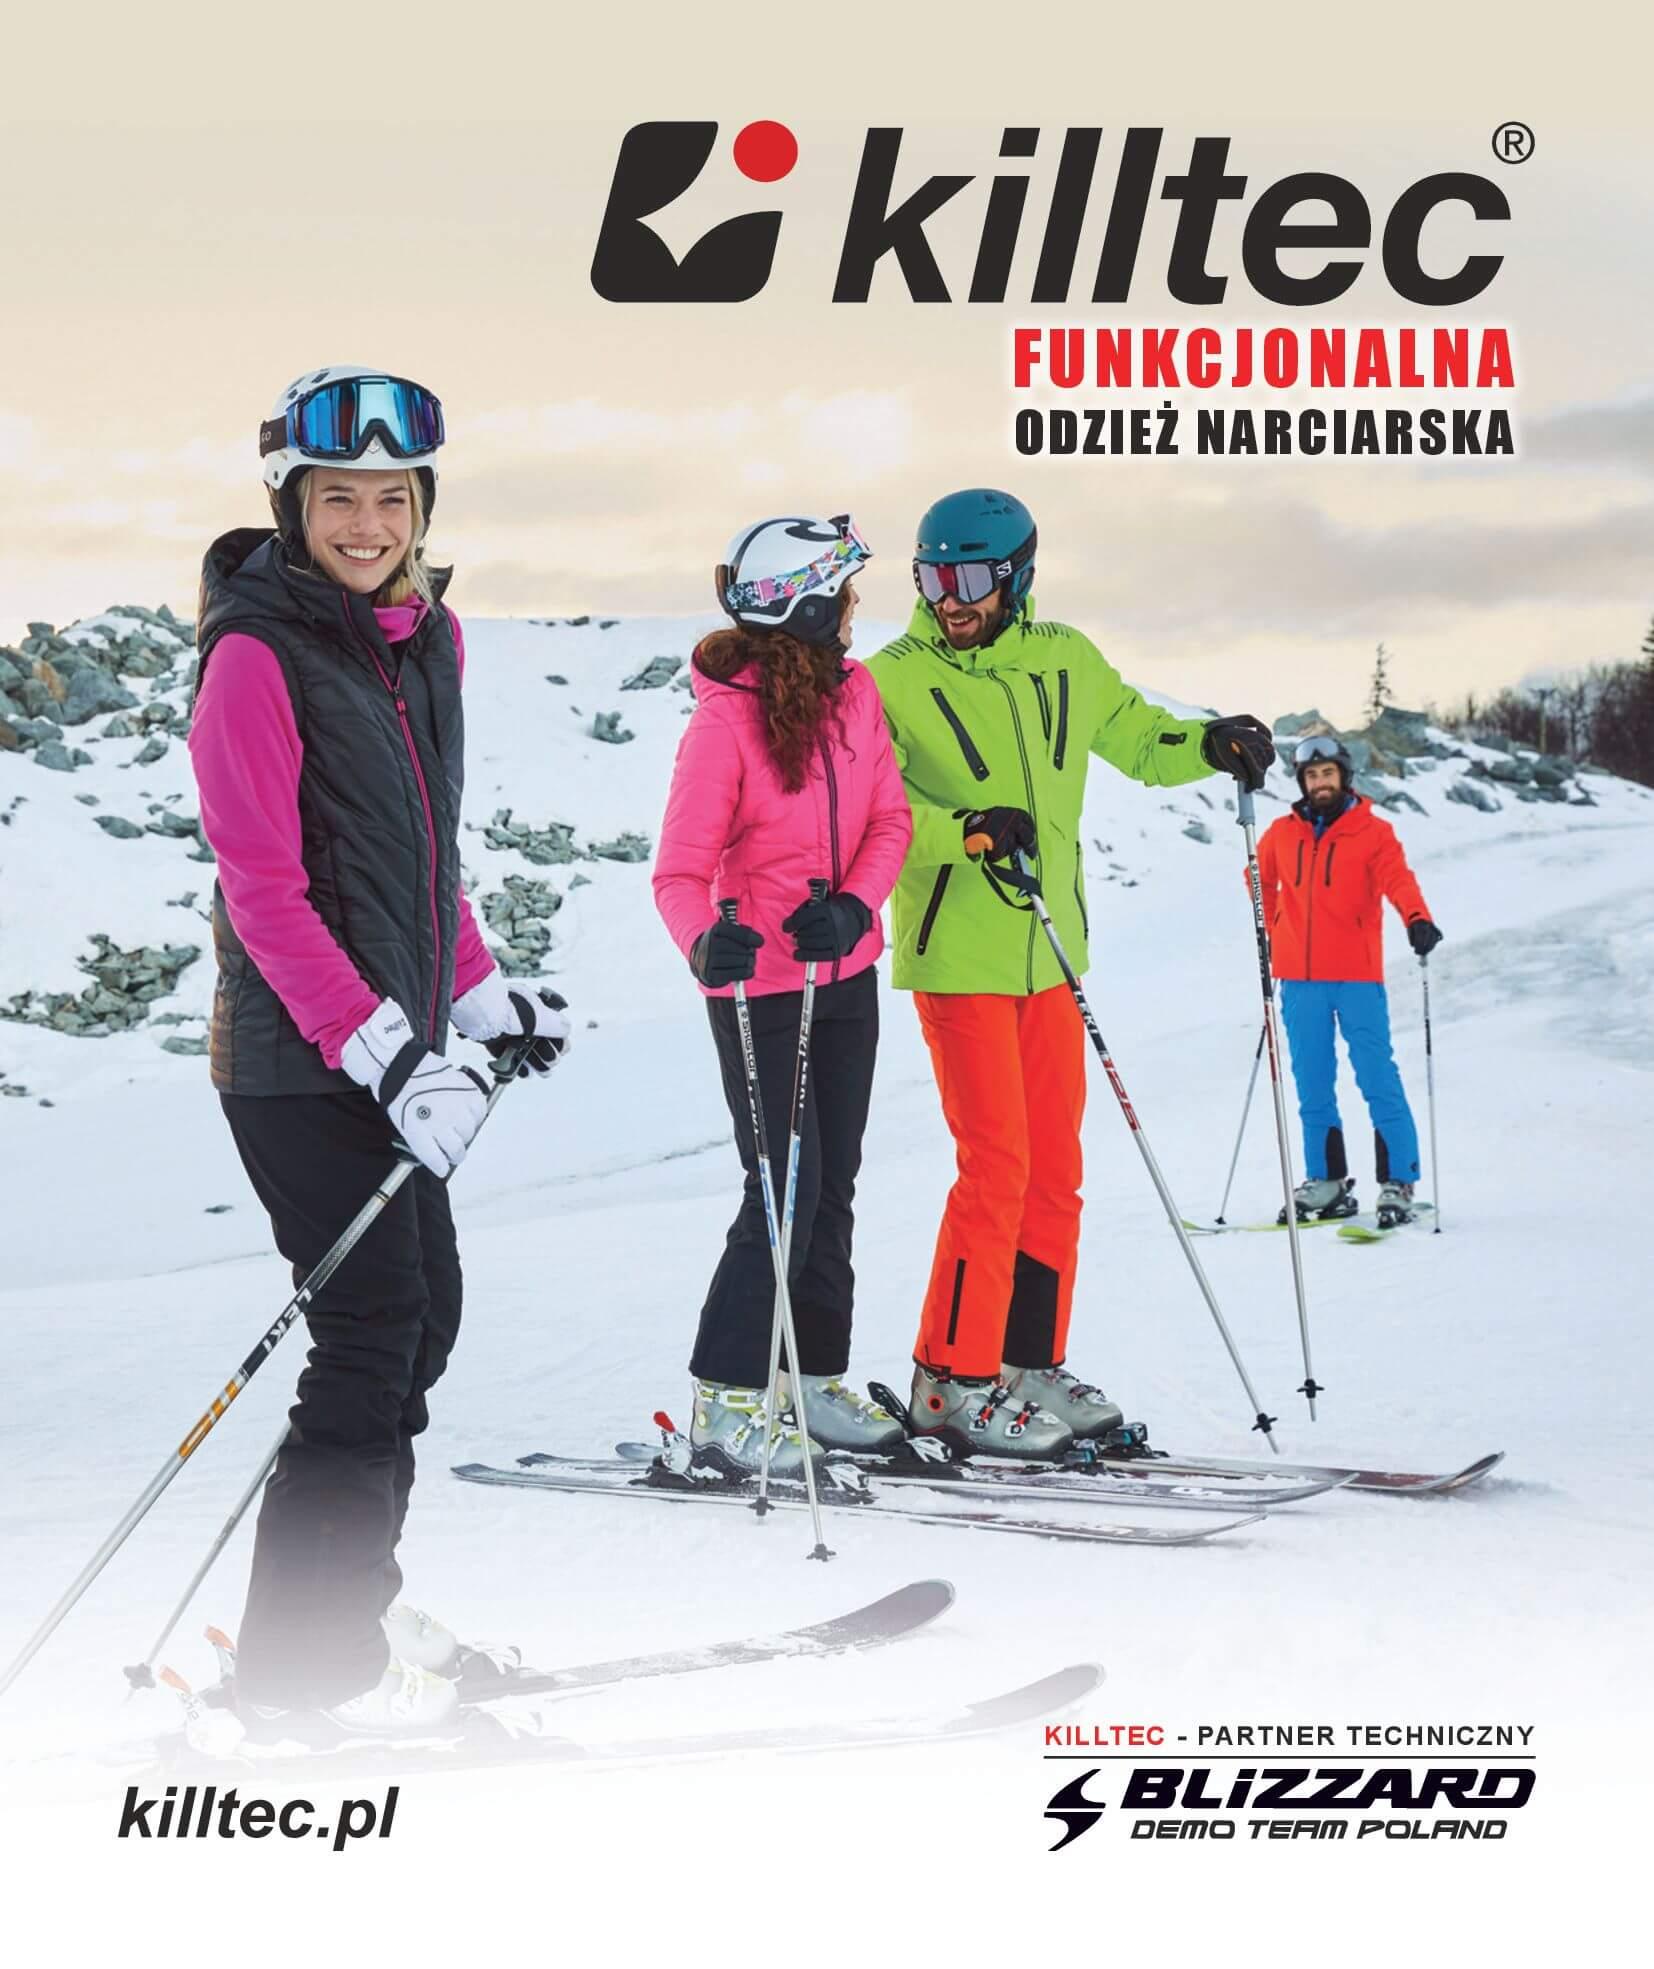 Gazetka Go Sport - Katalog Zima 2017/2018-12.11.2017-28.02.2018-page-180